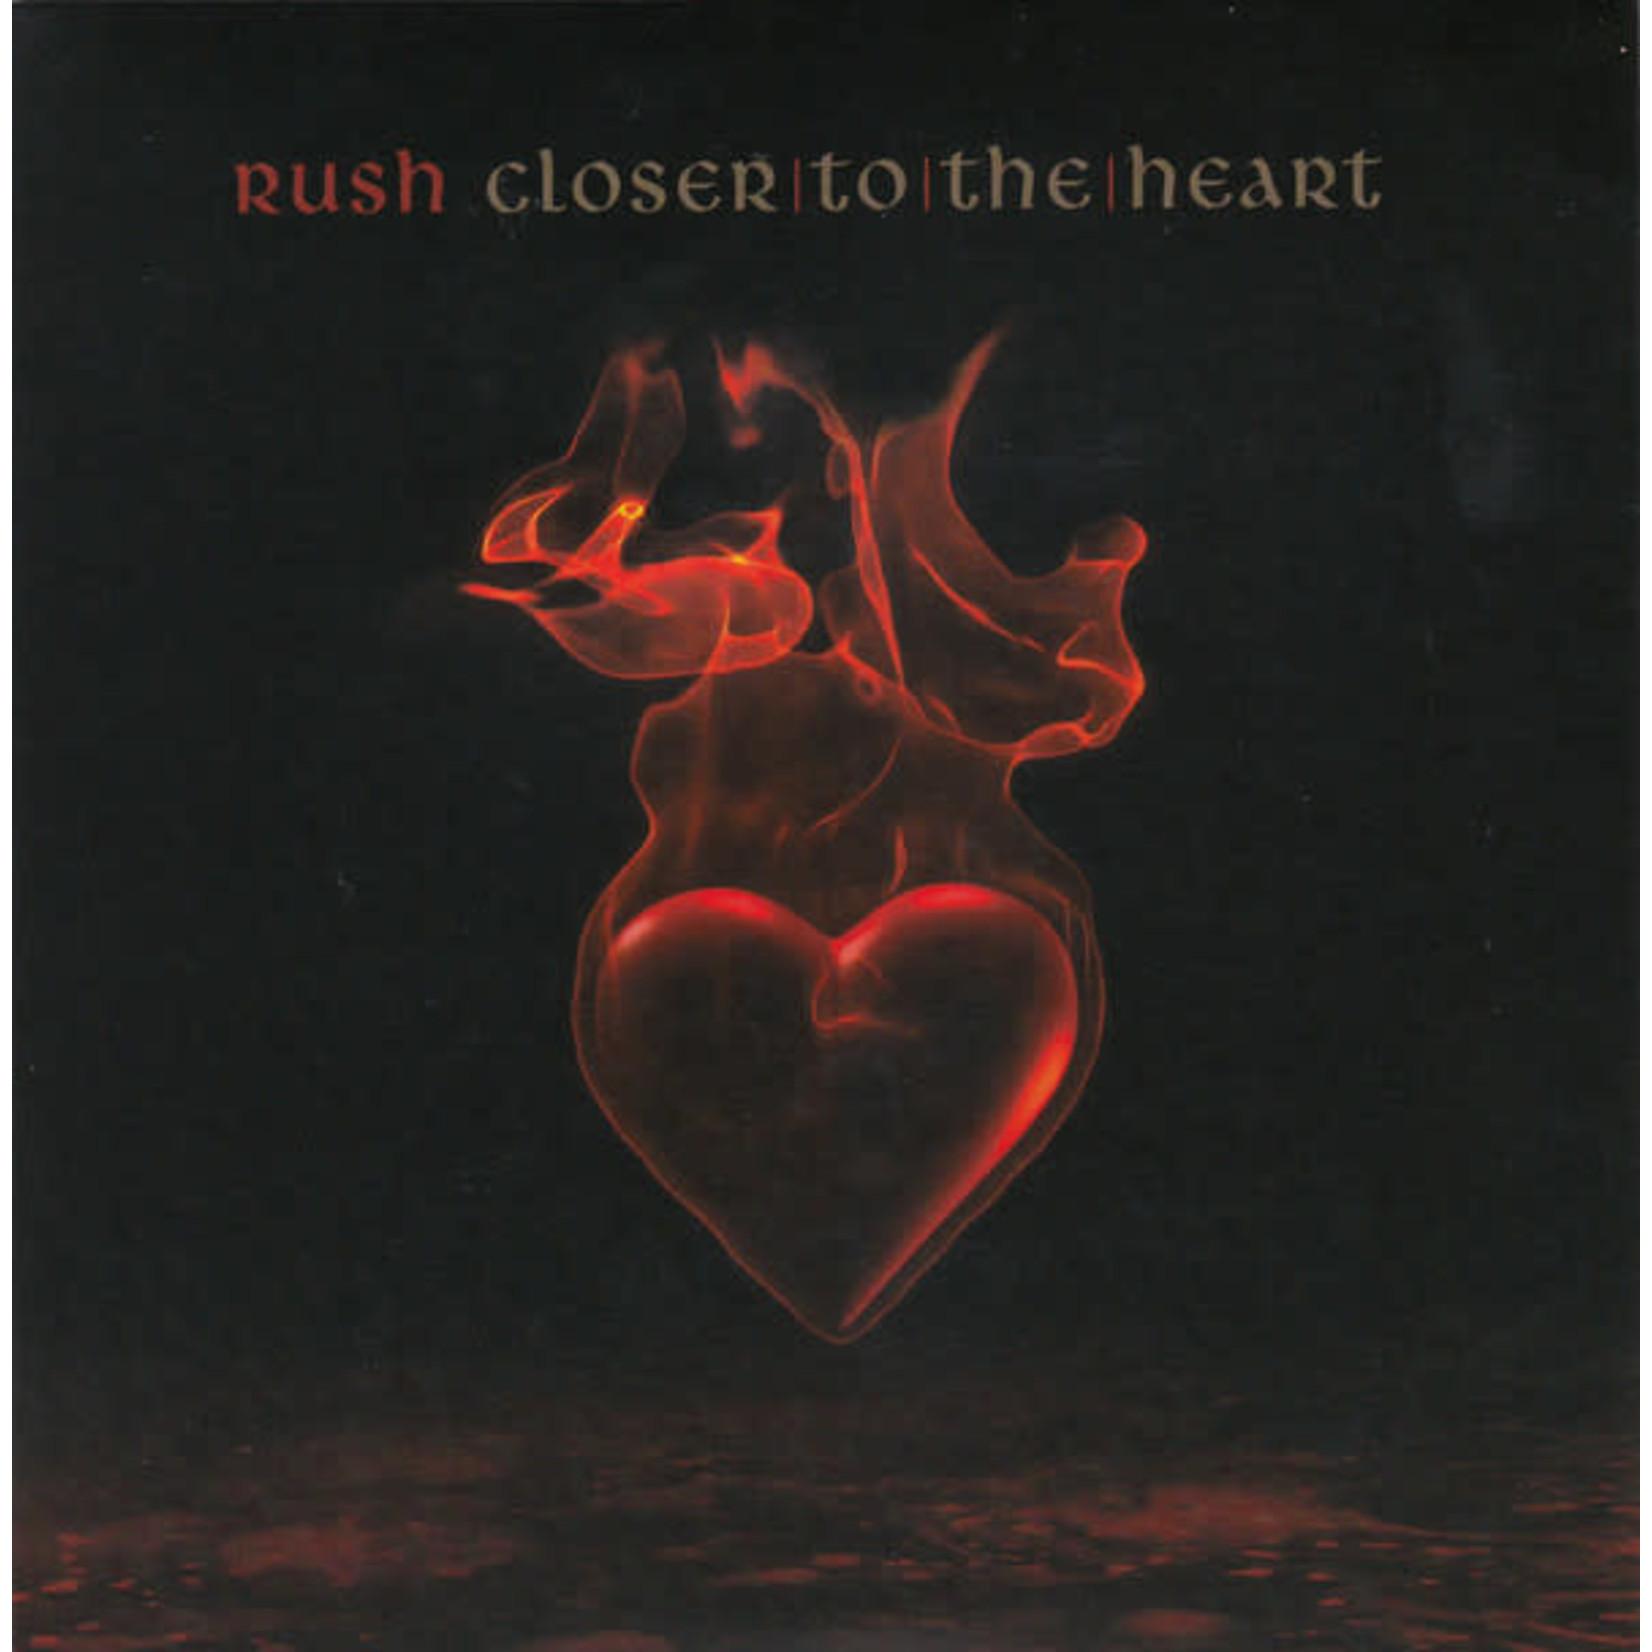 RUSH CLOSER TO THE HEART SINGLE (40th ANNIVERSARY)